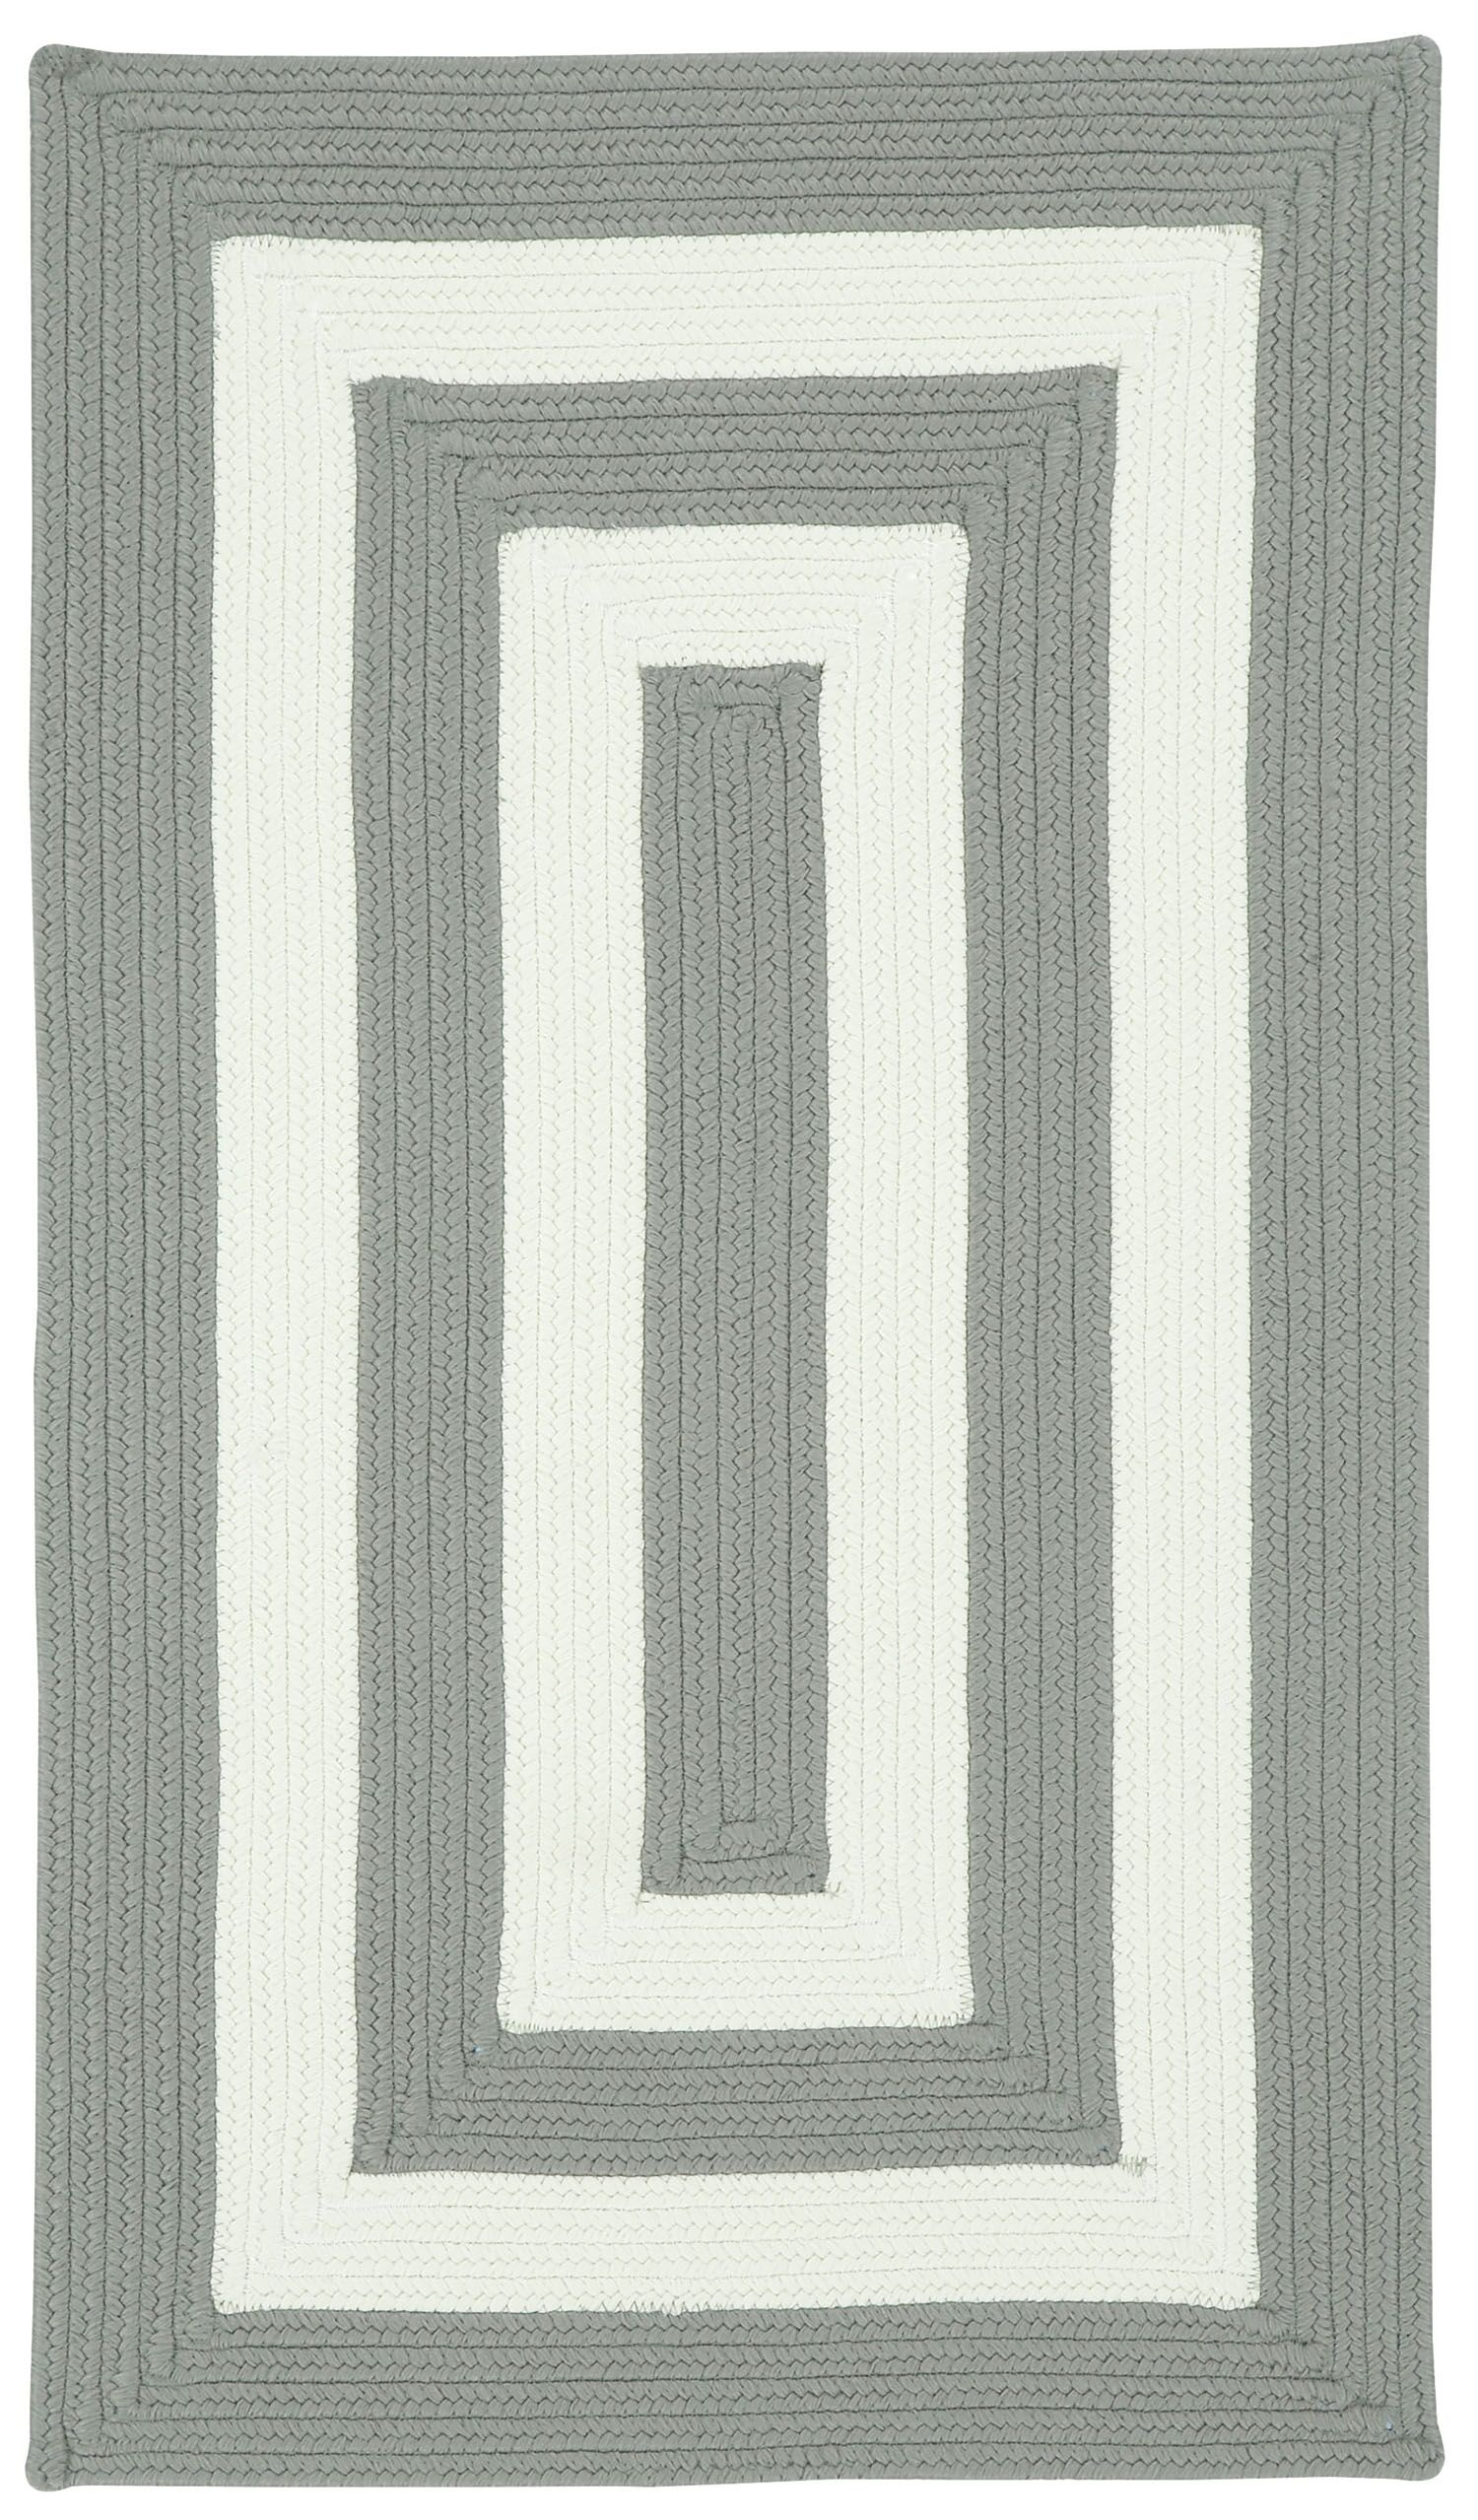 Mitscher Hand-Braided Beige Indoor/Outdoor Area Rug Rug Size: Concentric 2'3